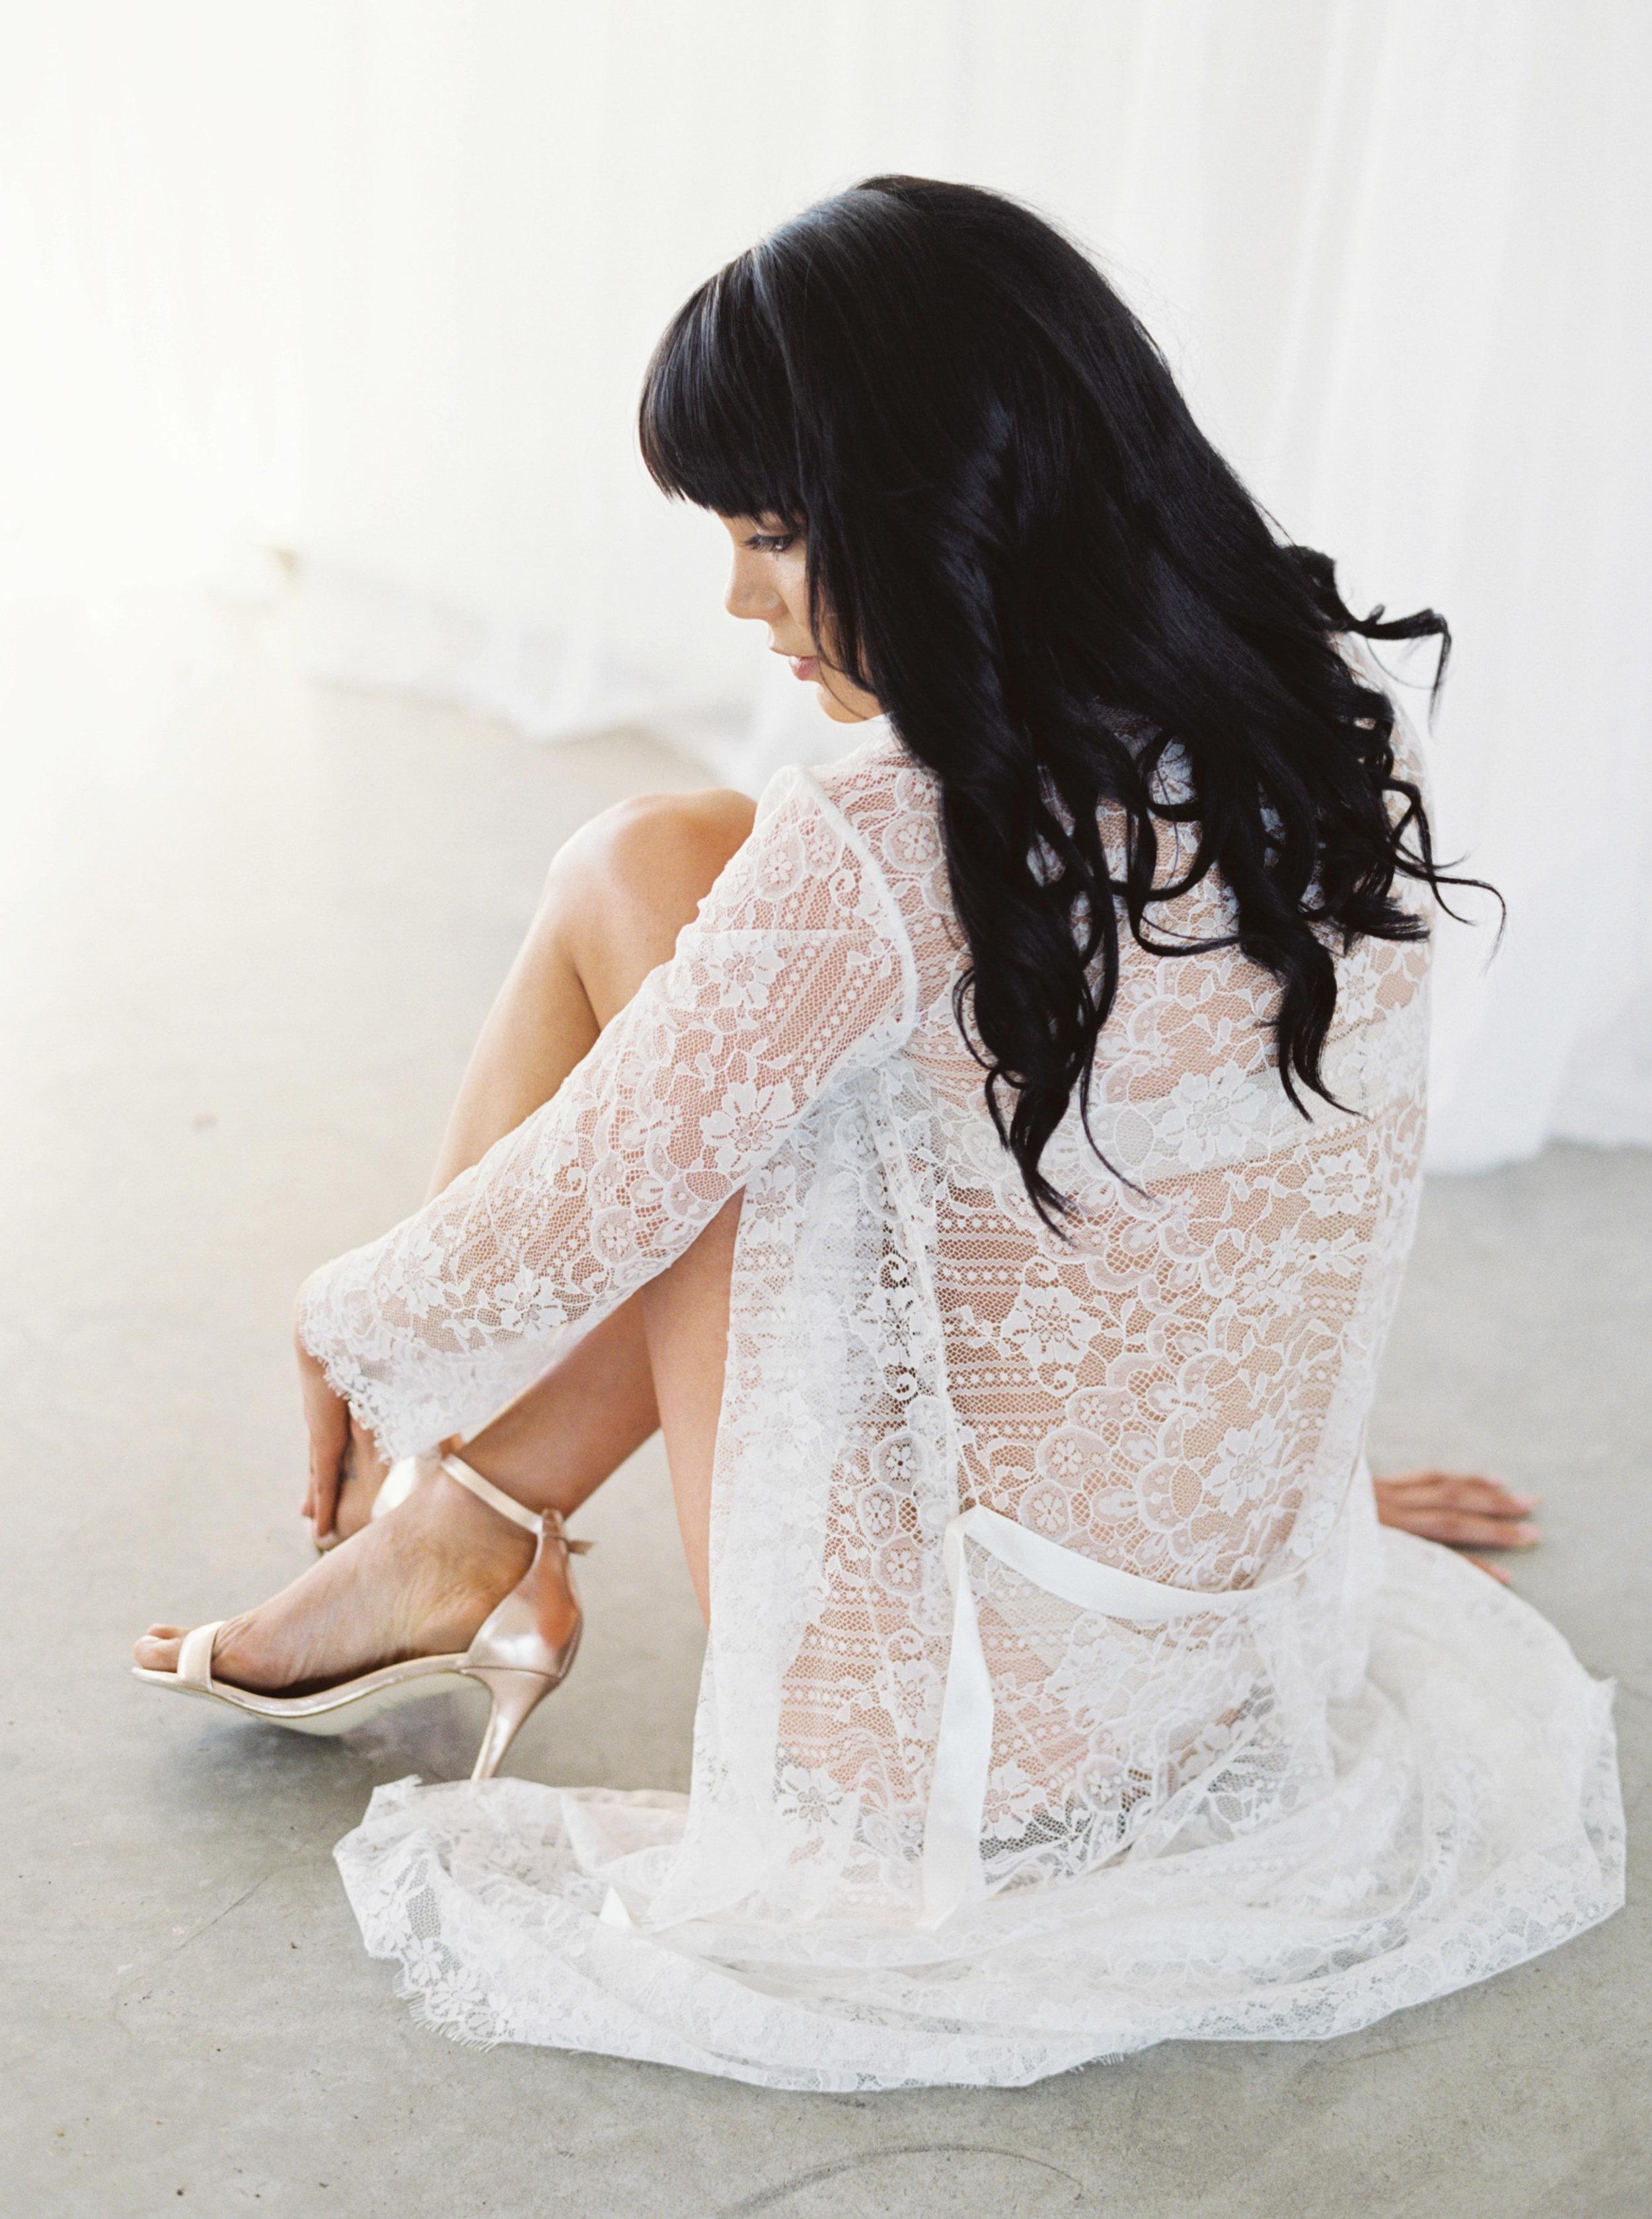 00025- Mudgee Wedding Photographer Sheri McMahon.jpg